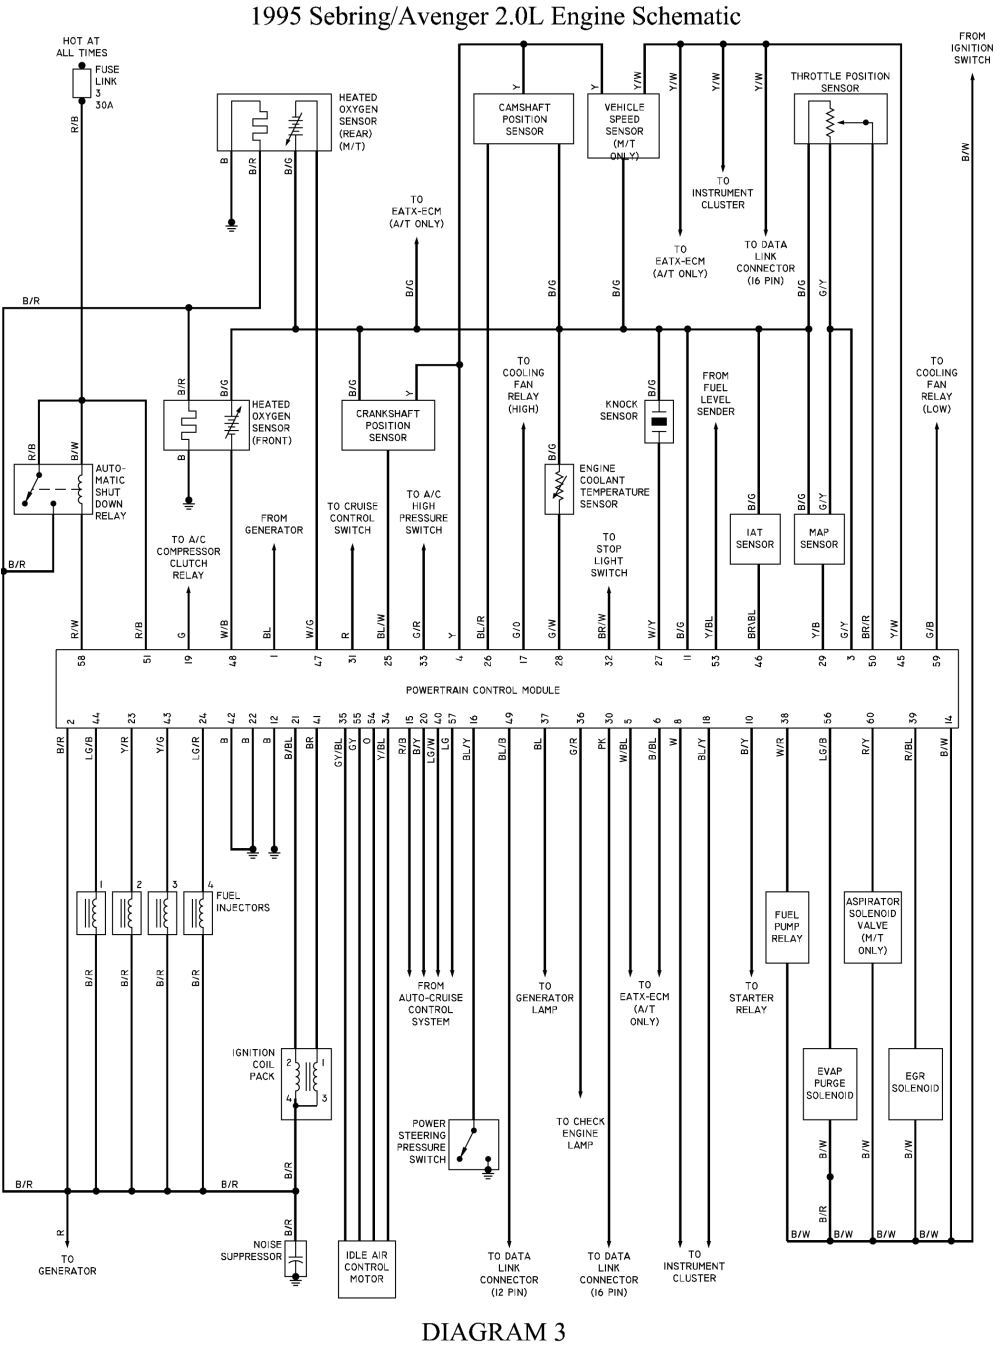 wiring diagram for 2001 chrysler sebring wiring diagram toolbox 2002 chrysler sebring ignition wiring diagram